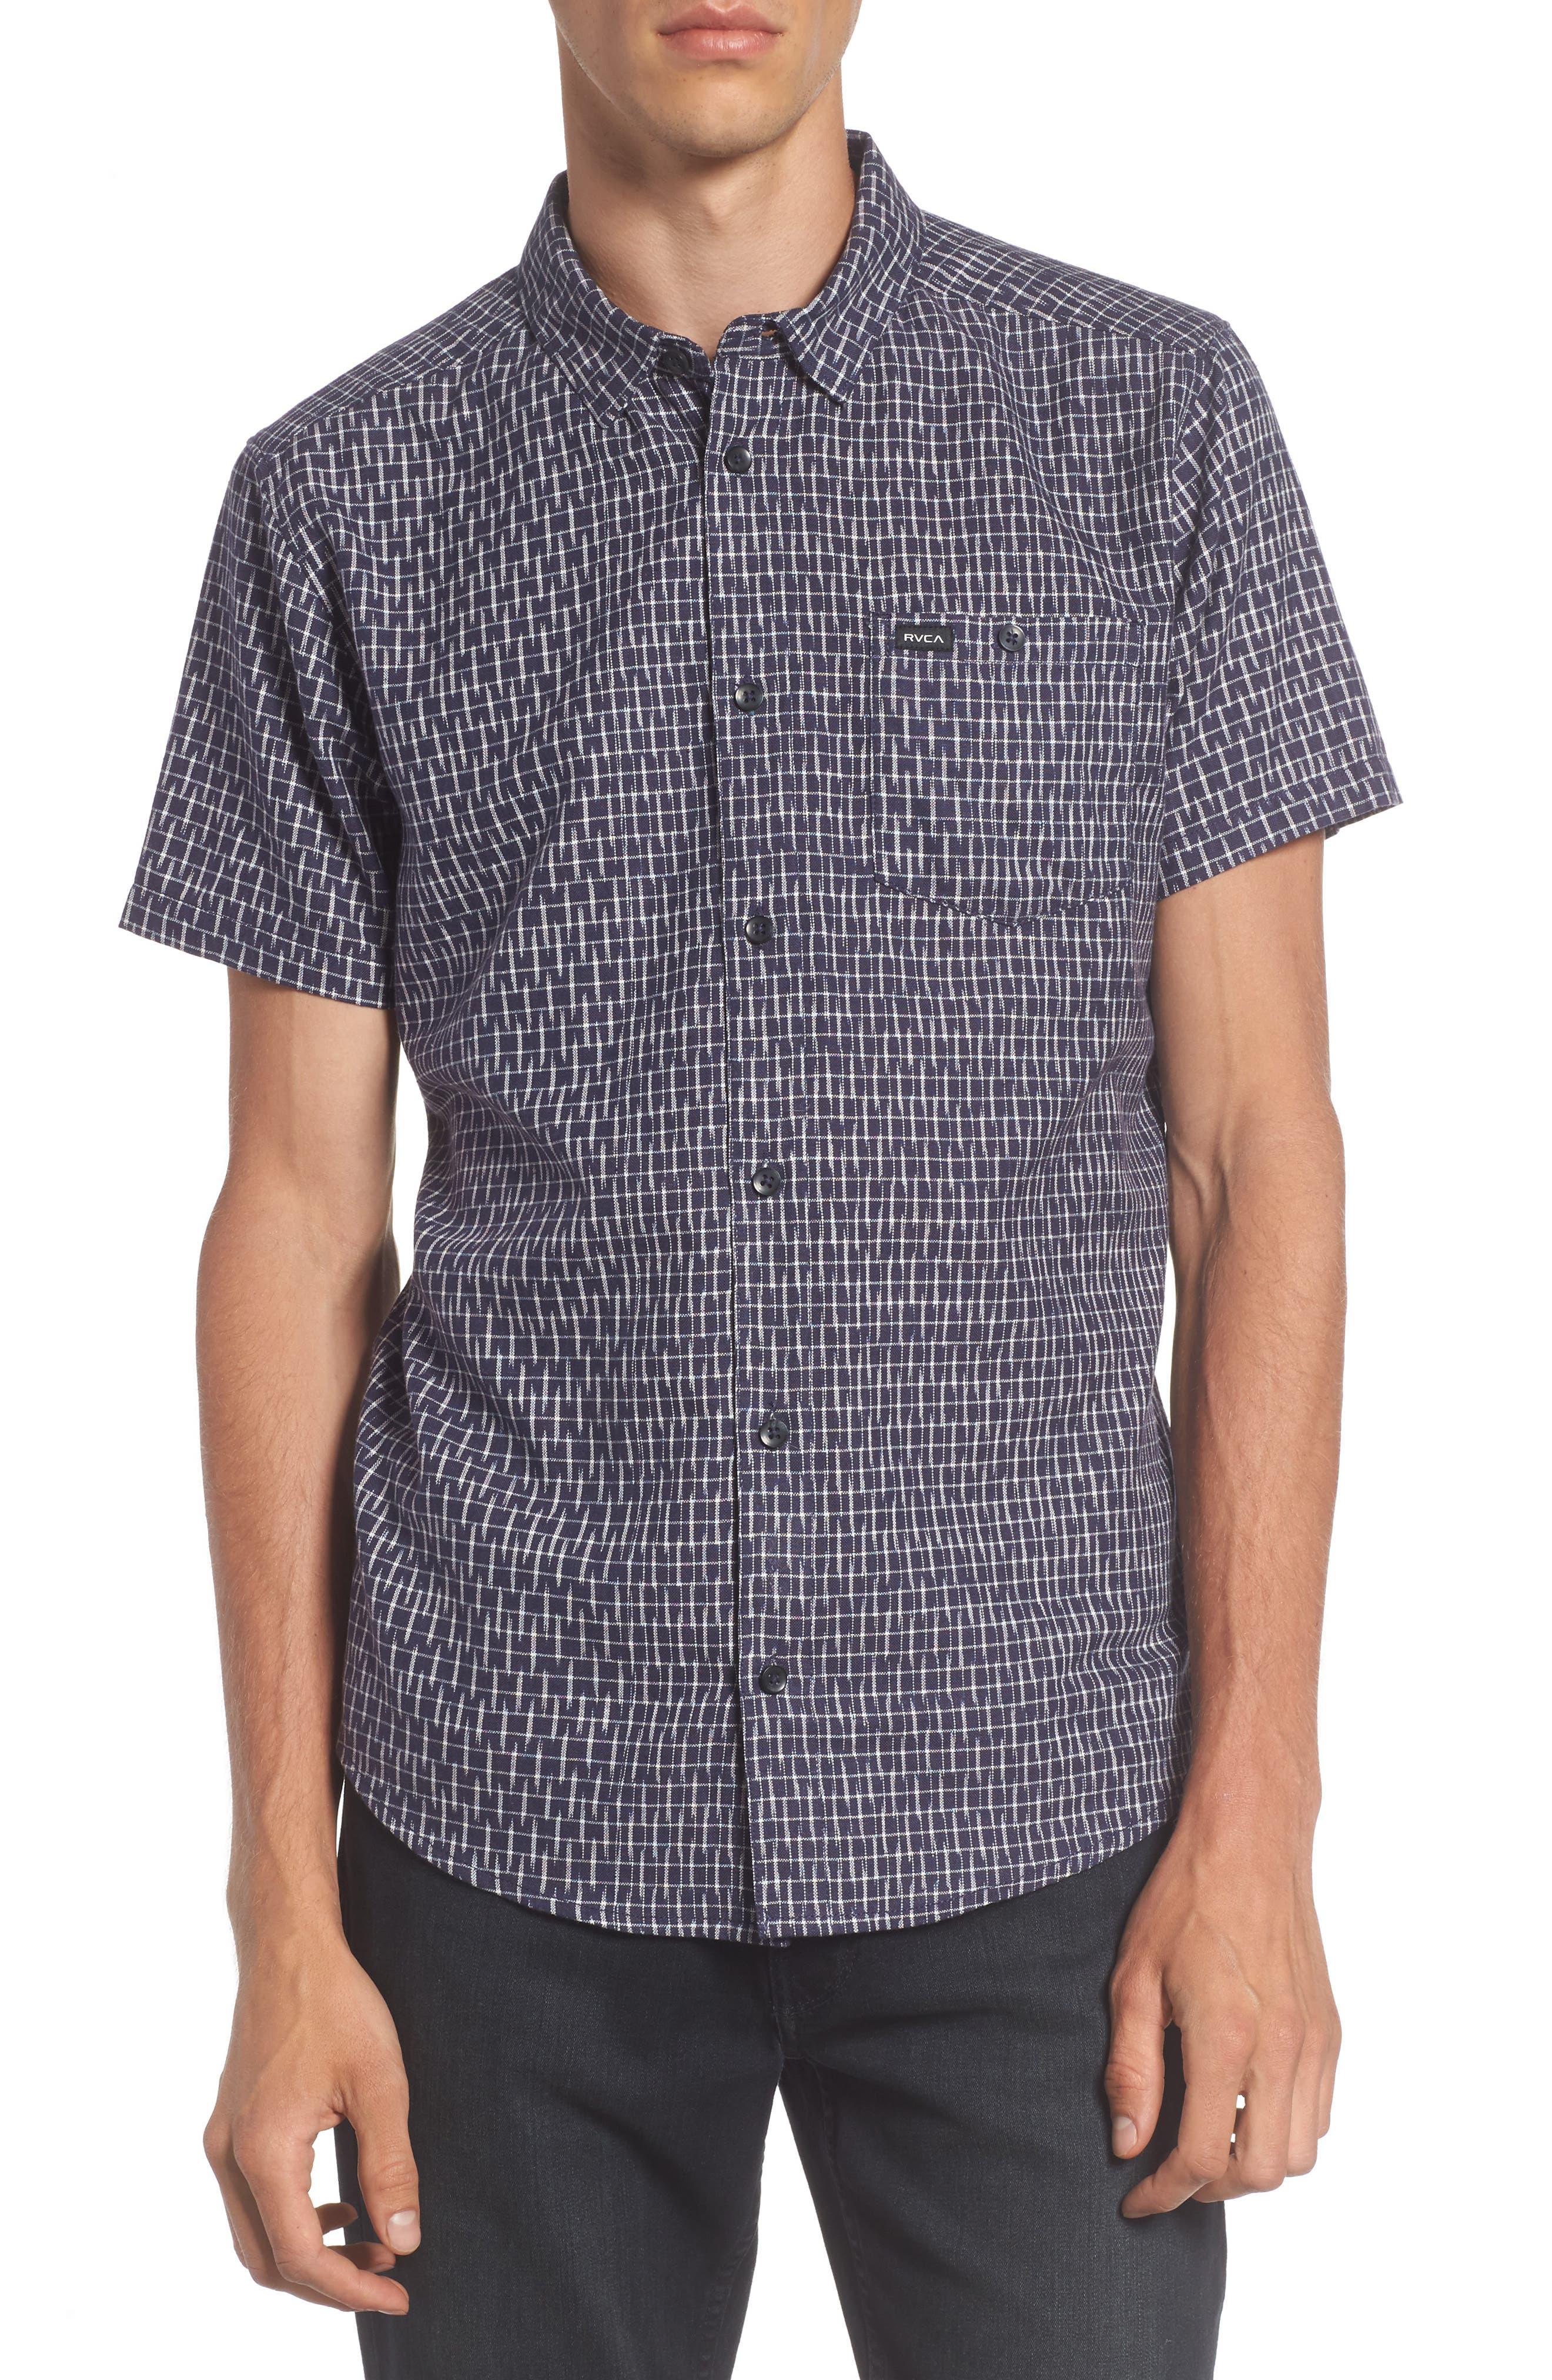 RVCA Fontana Print Woven Shirt